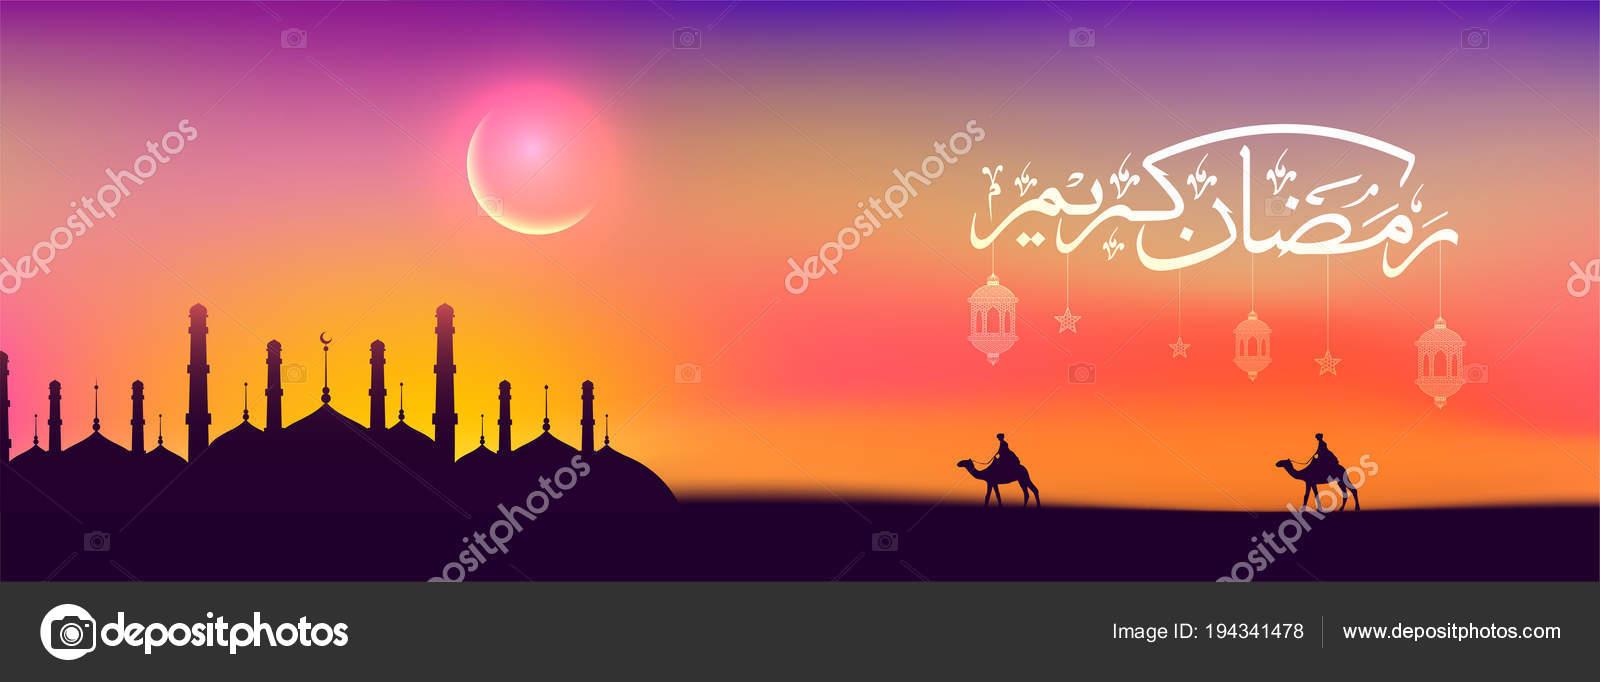 Web Header Banner Design Mosque People Riding Camel